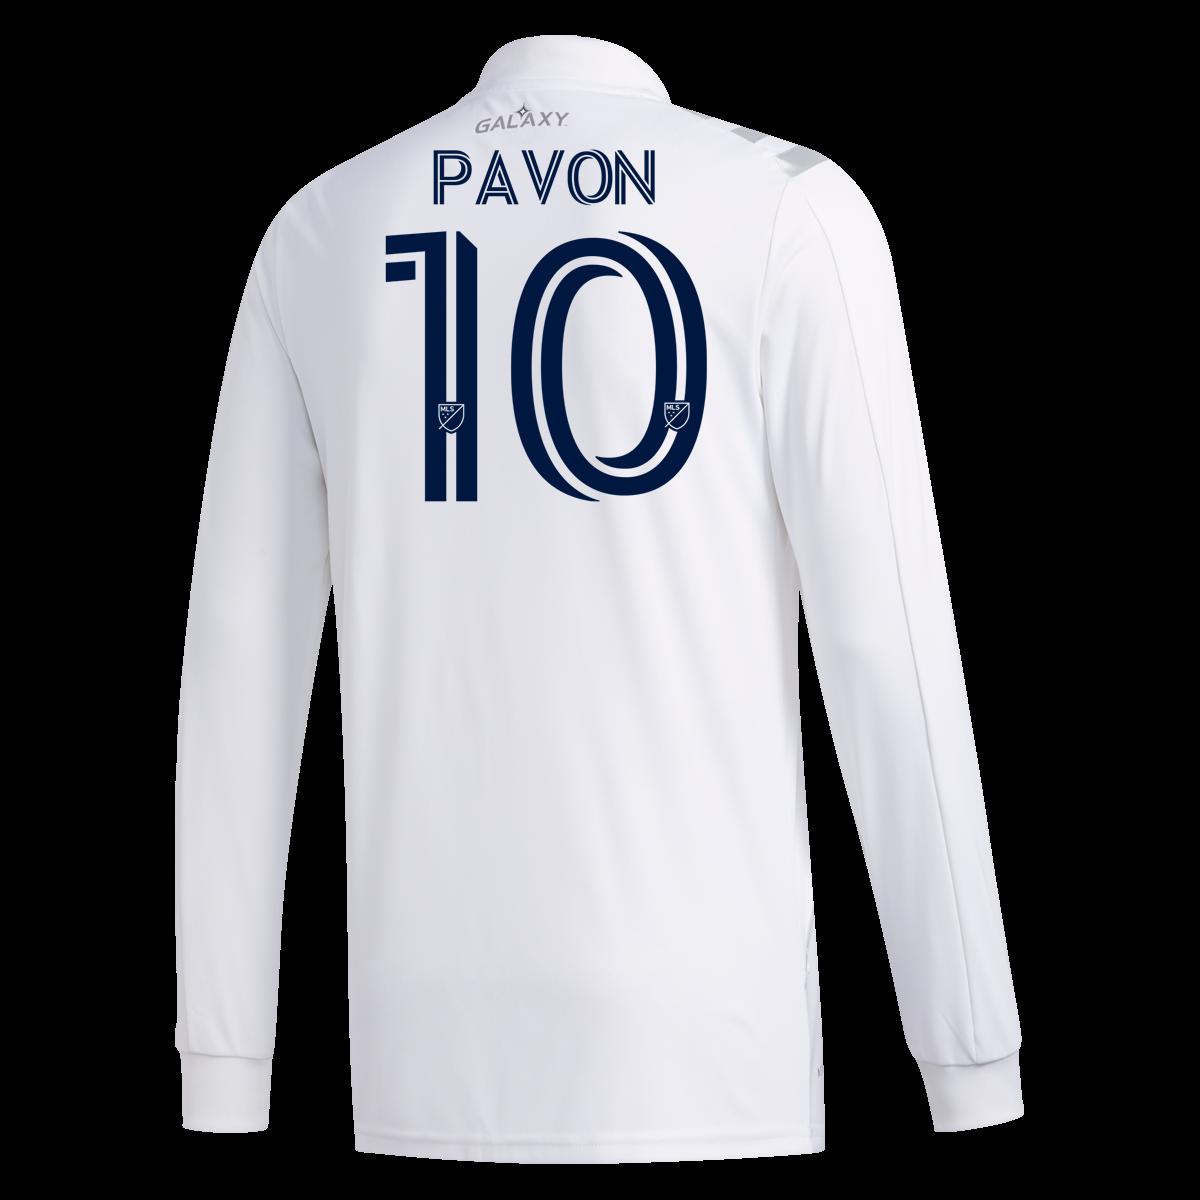 Adidas Cristian Pavon La Galaxy Long Sleeve Home Jersey 2020 S In 2020 Long Sleeve Jersey